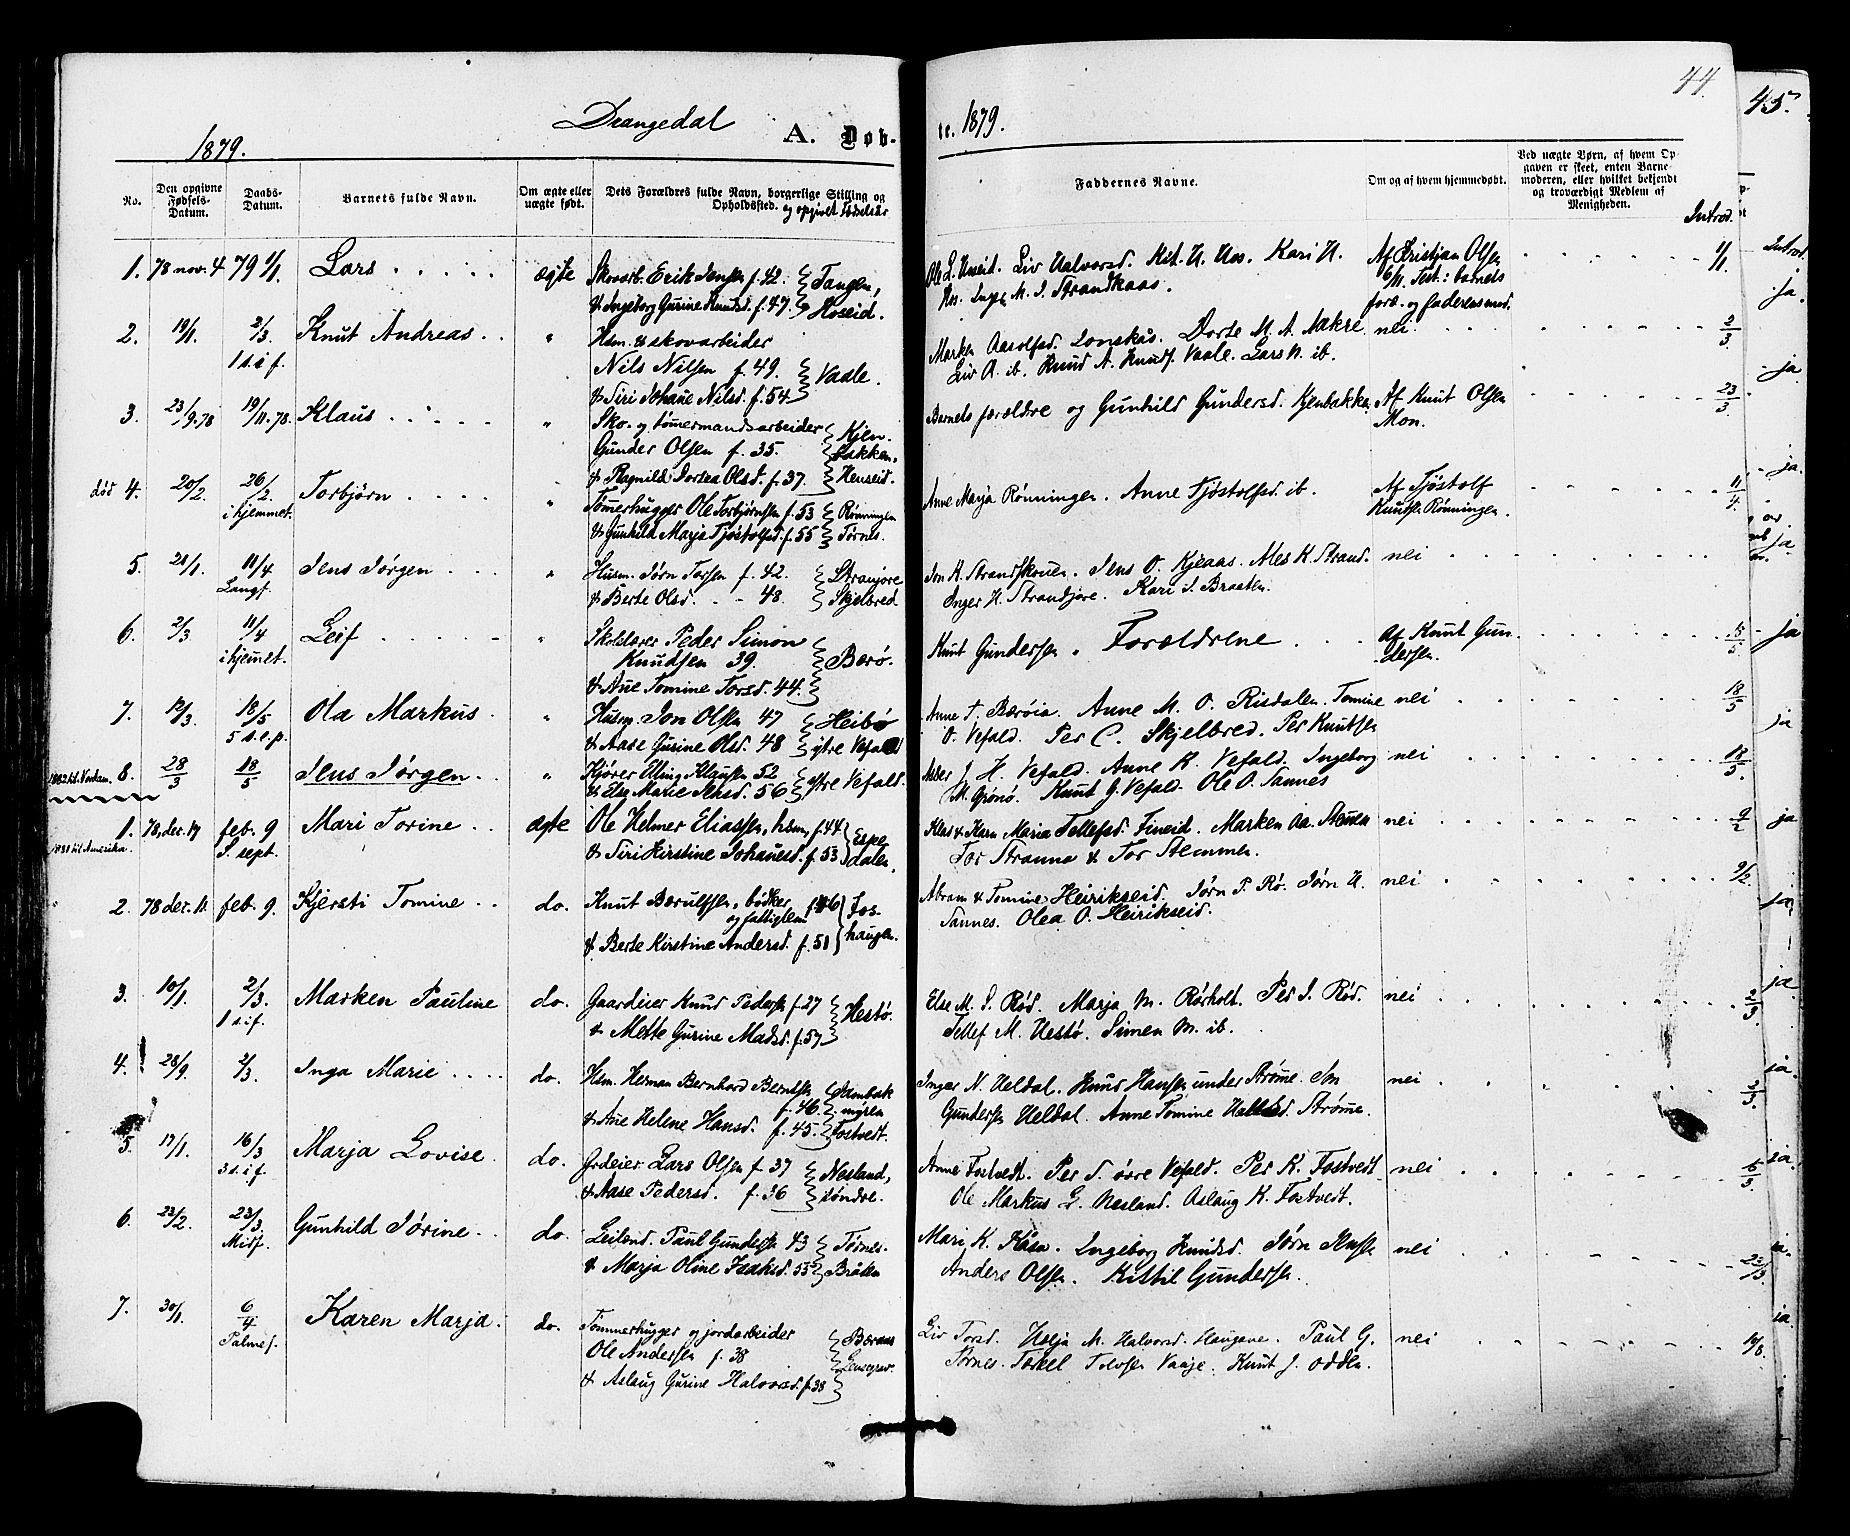 SAKO, Drangedal kirkebøker, F/Fa/L0009: Ministerialbok nr. 9 /1, 1872-1884, s. 44